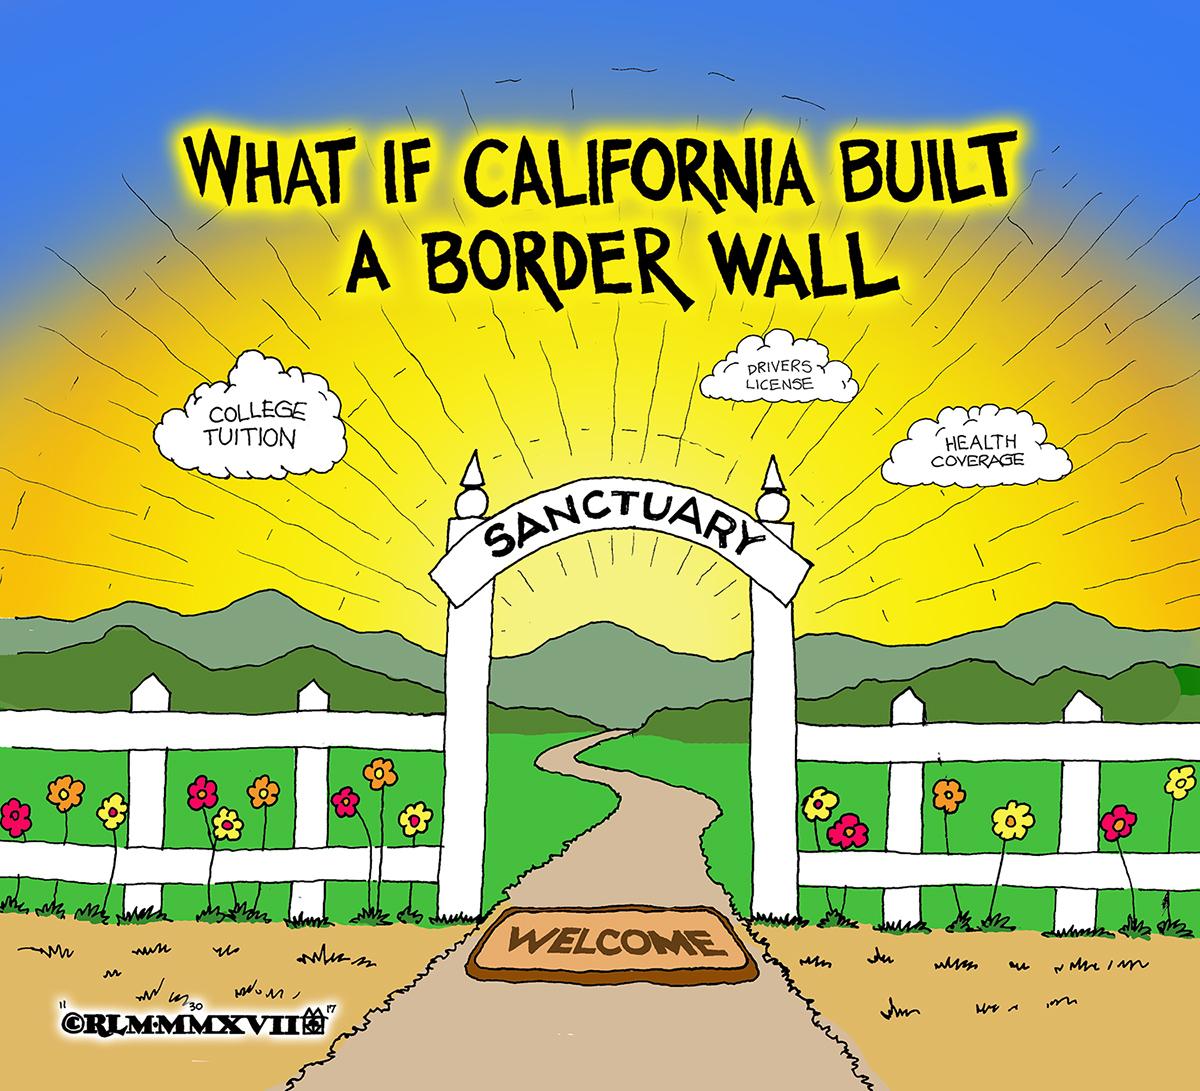 A California-Style Border Wall